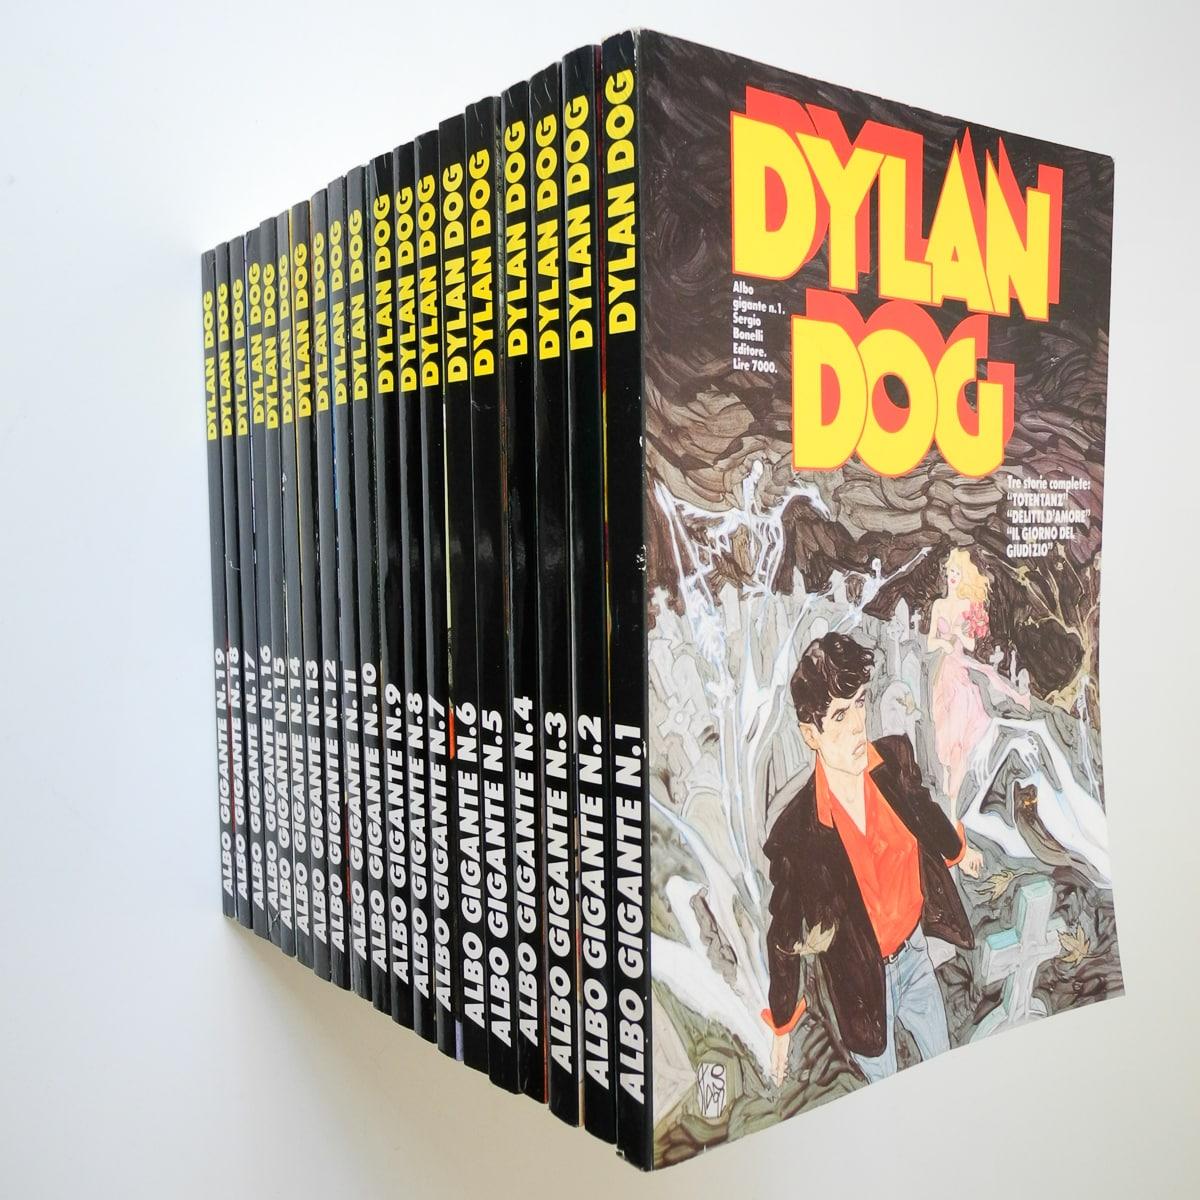 Dylan Dog Albo Gigante n. 1/19 Daim Press/Bonelli